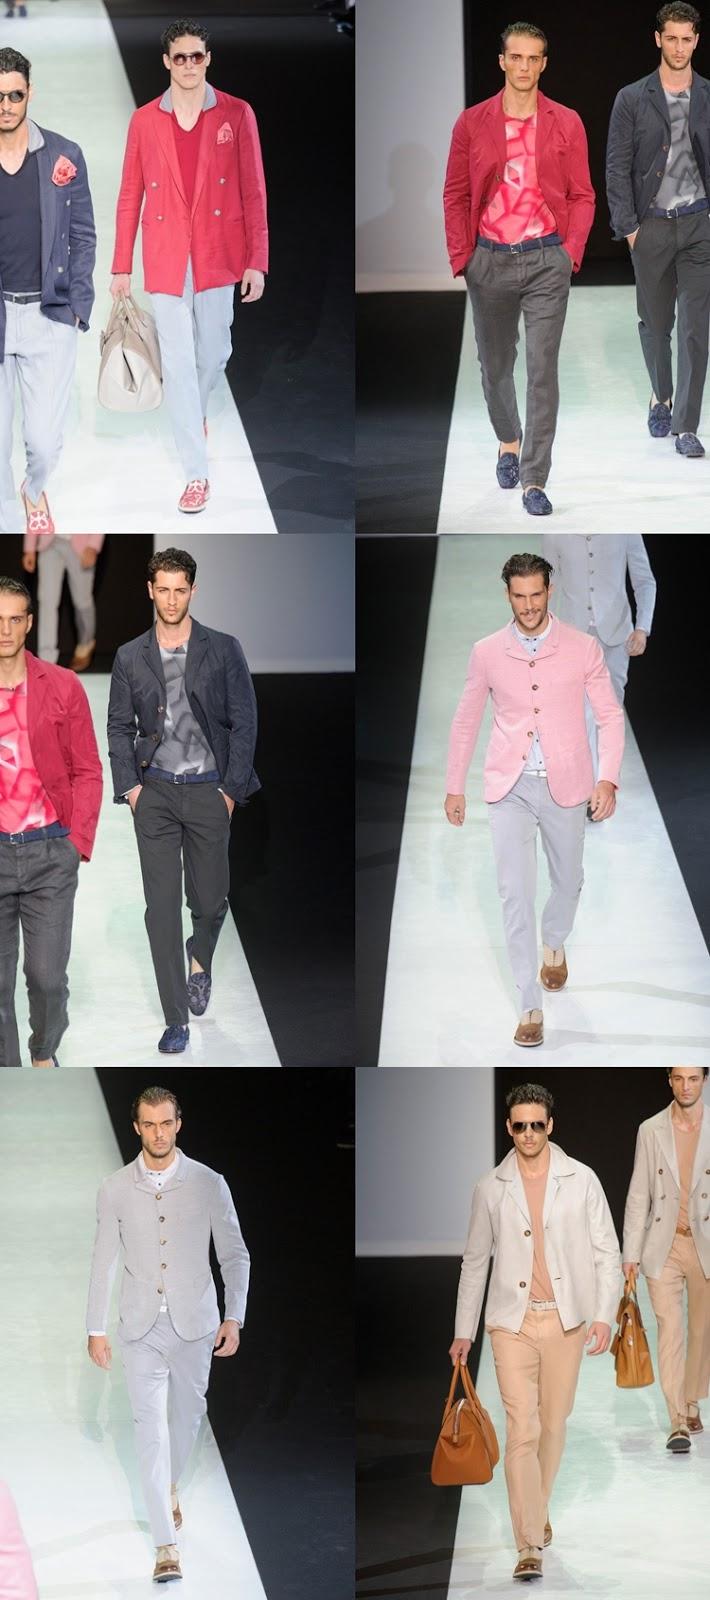 entire collection cheap price first look Milão: GIORGIO ARMANI Verão 2014 Masculino - ALEX CURSINO ...